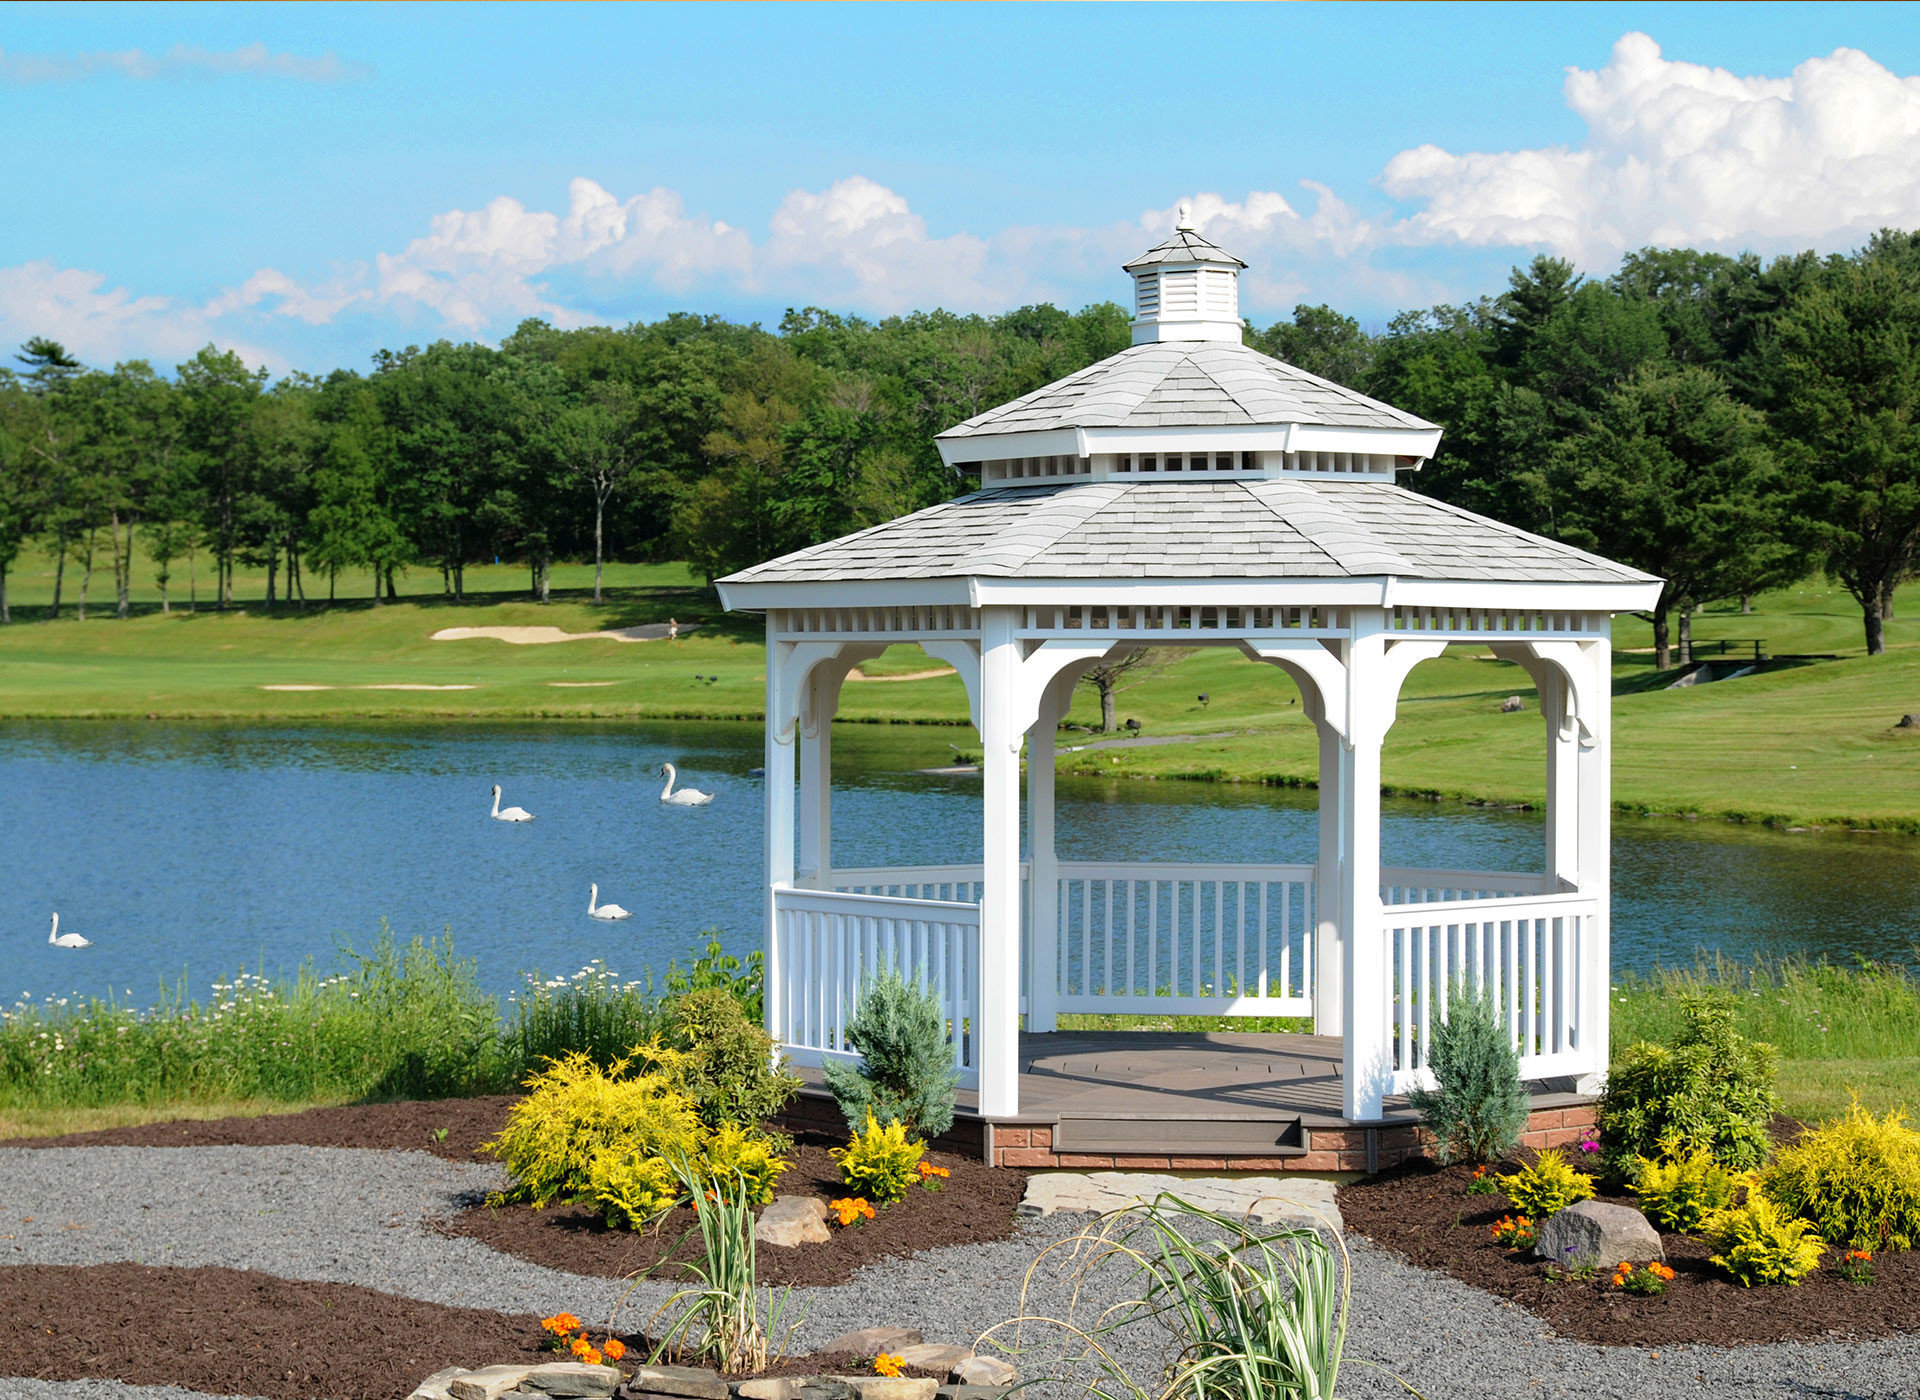 tree grass sky building gazebo Lake flower outdoor structure park pavilion Garden pond surrounded stone